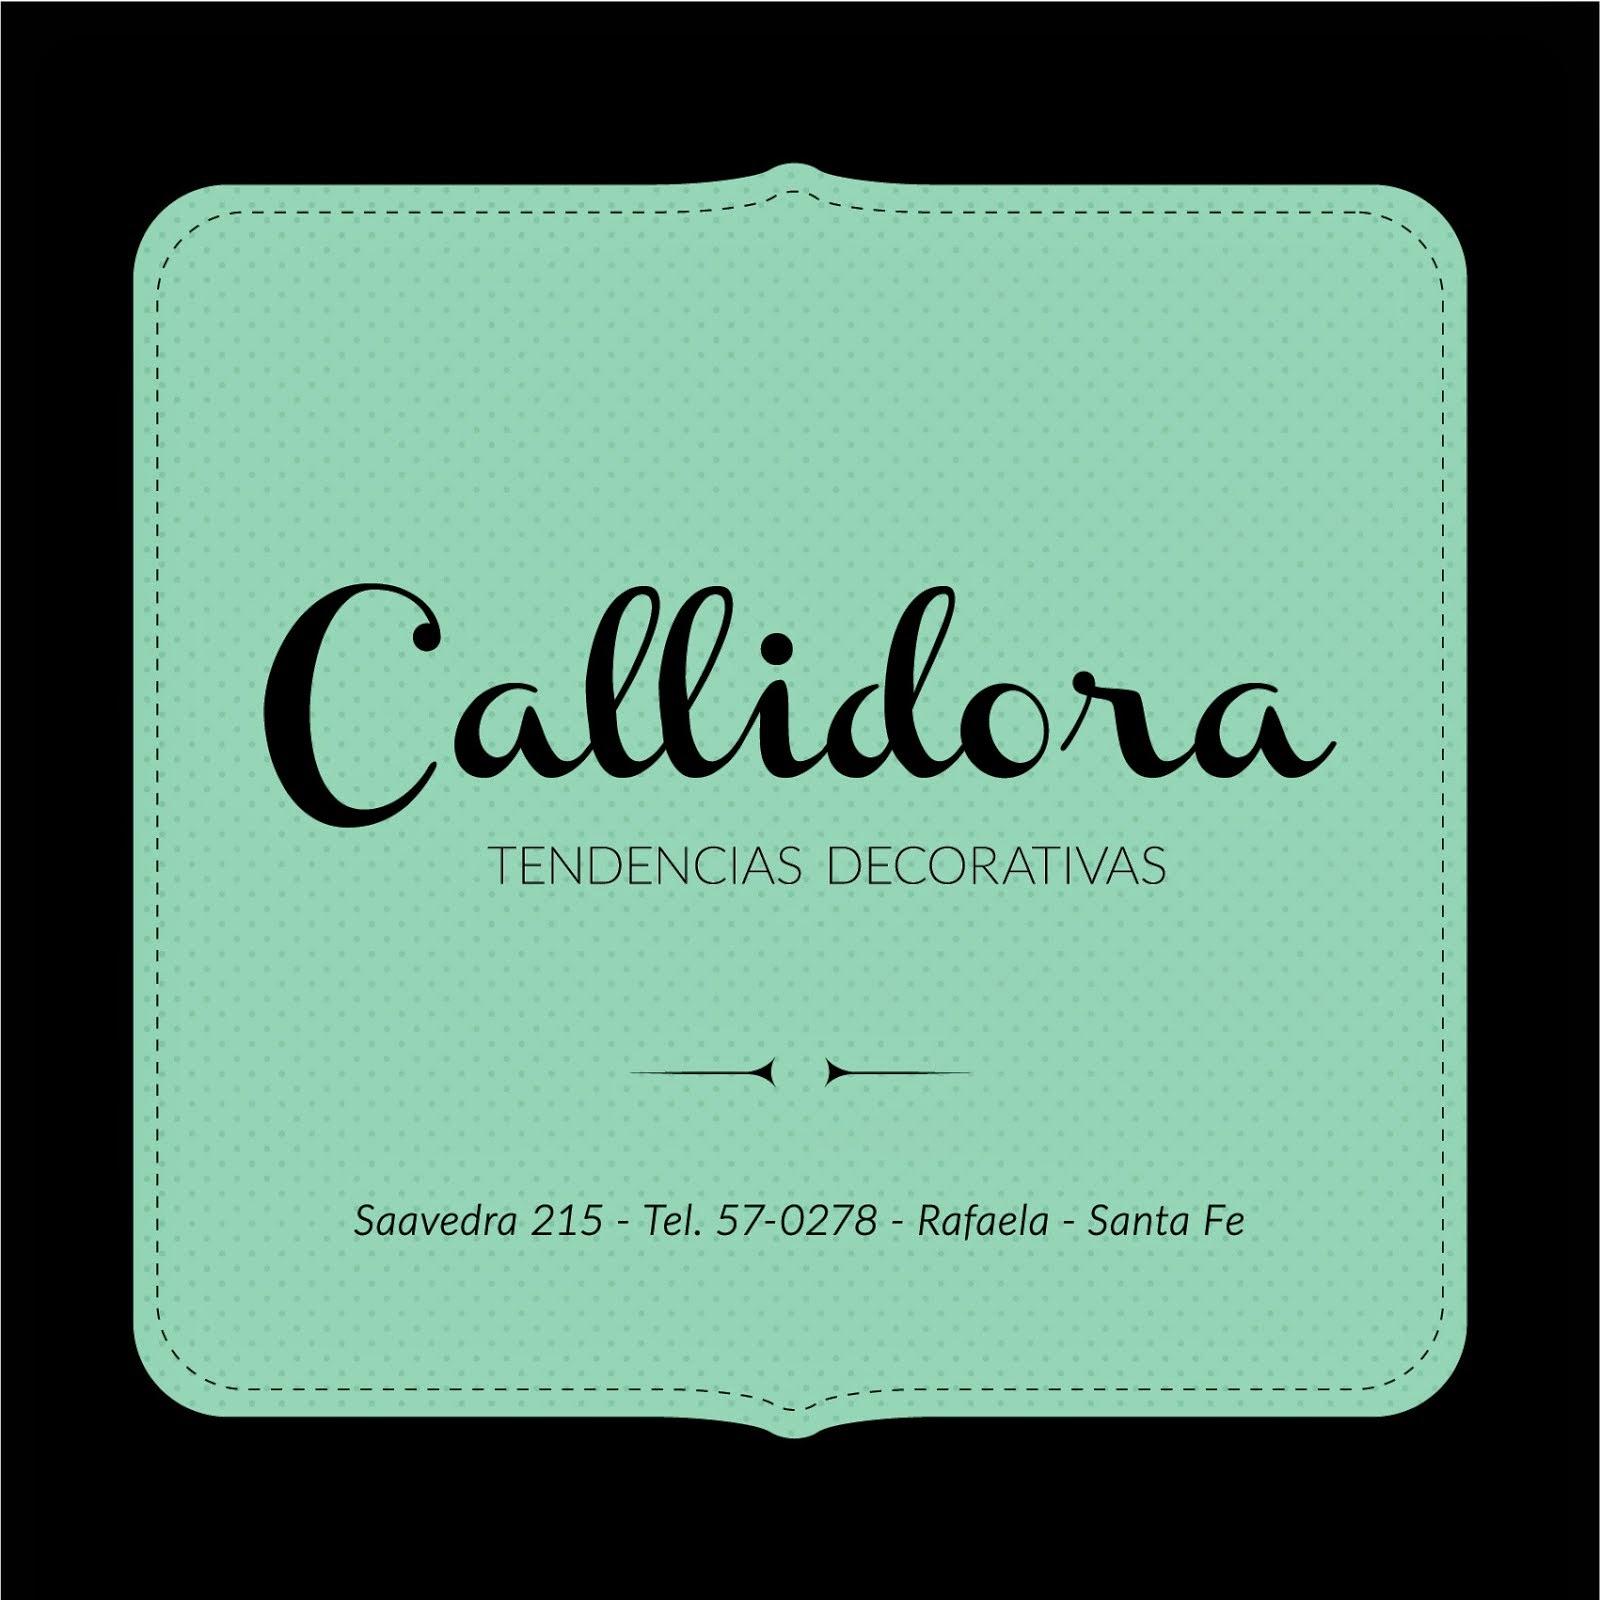 Callidora